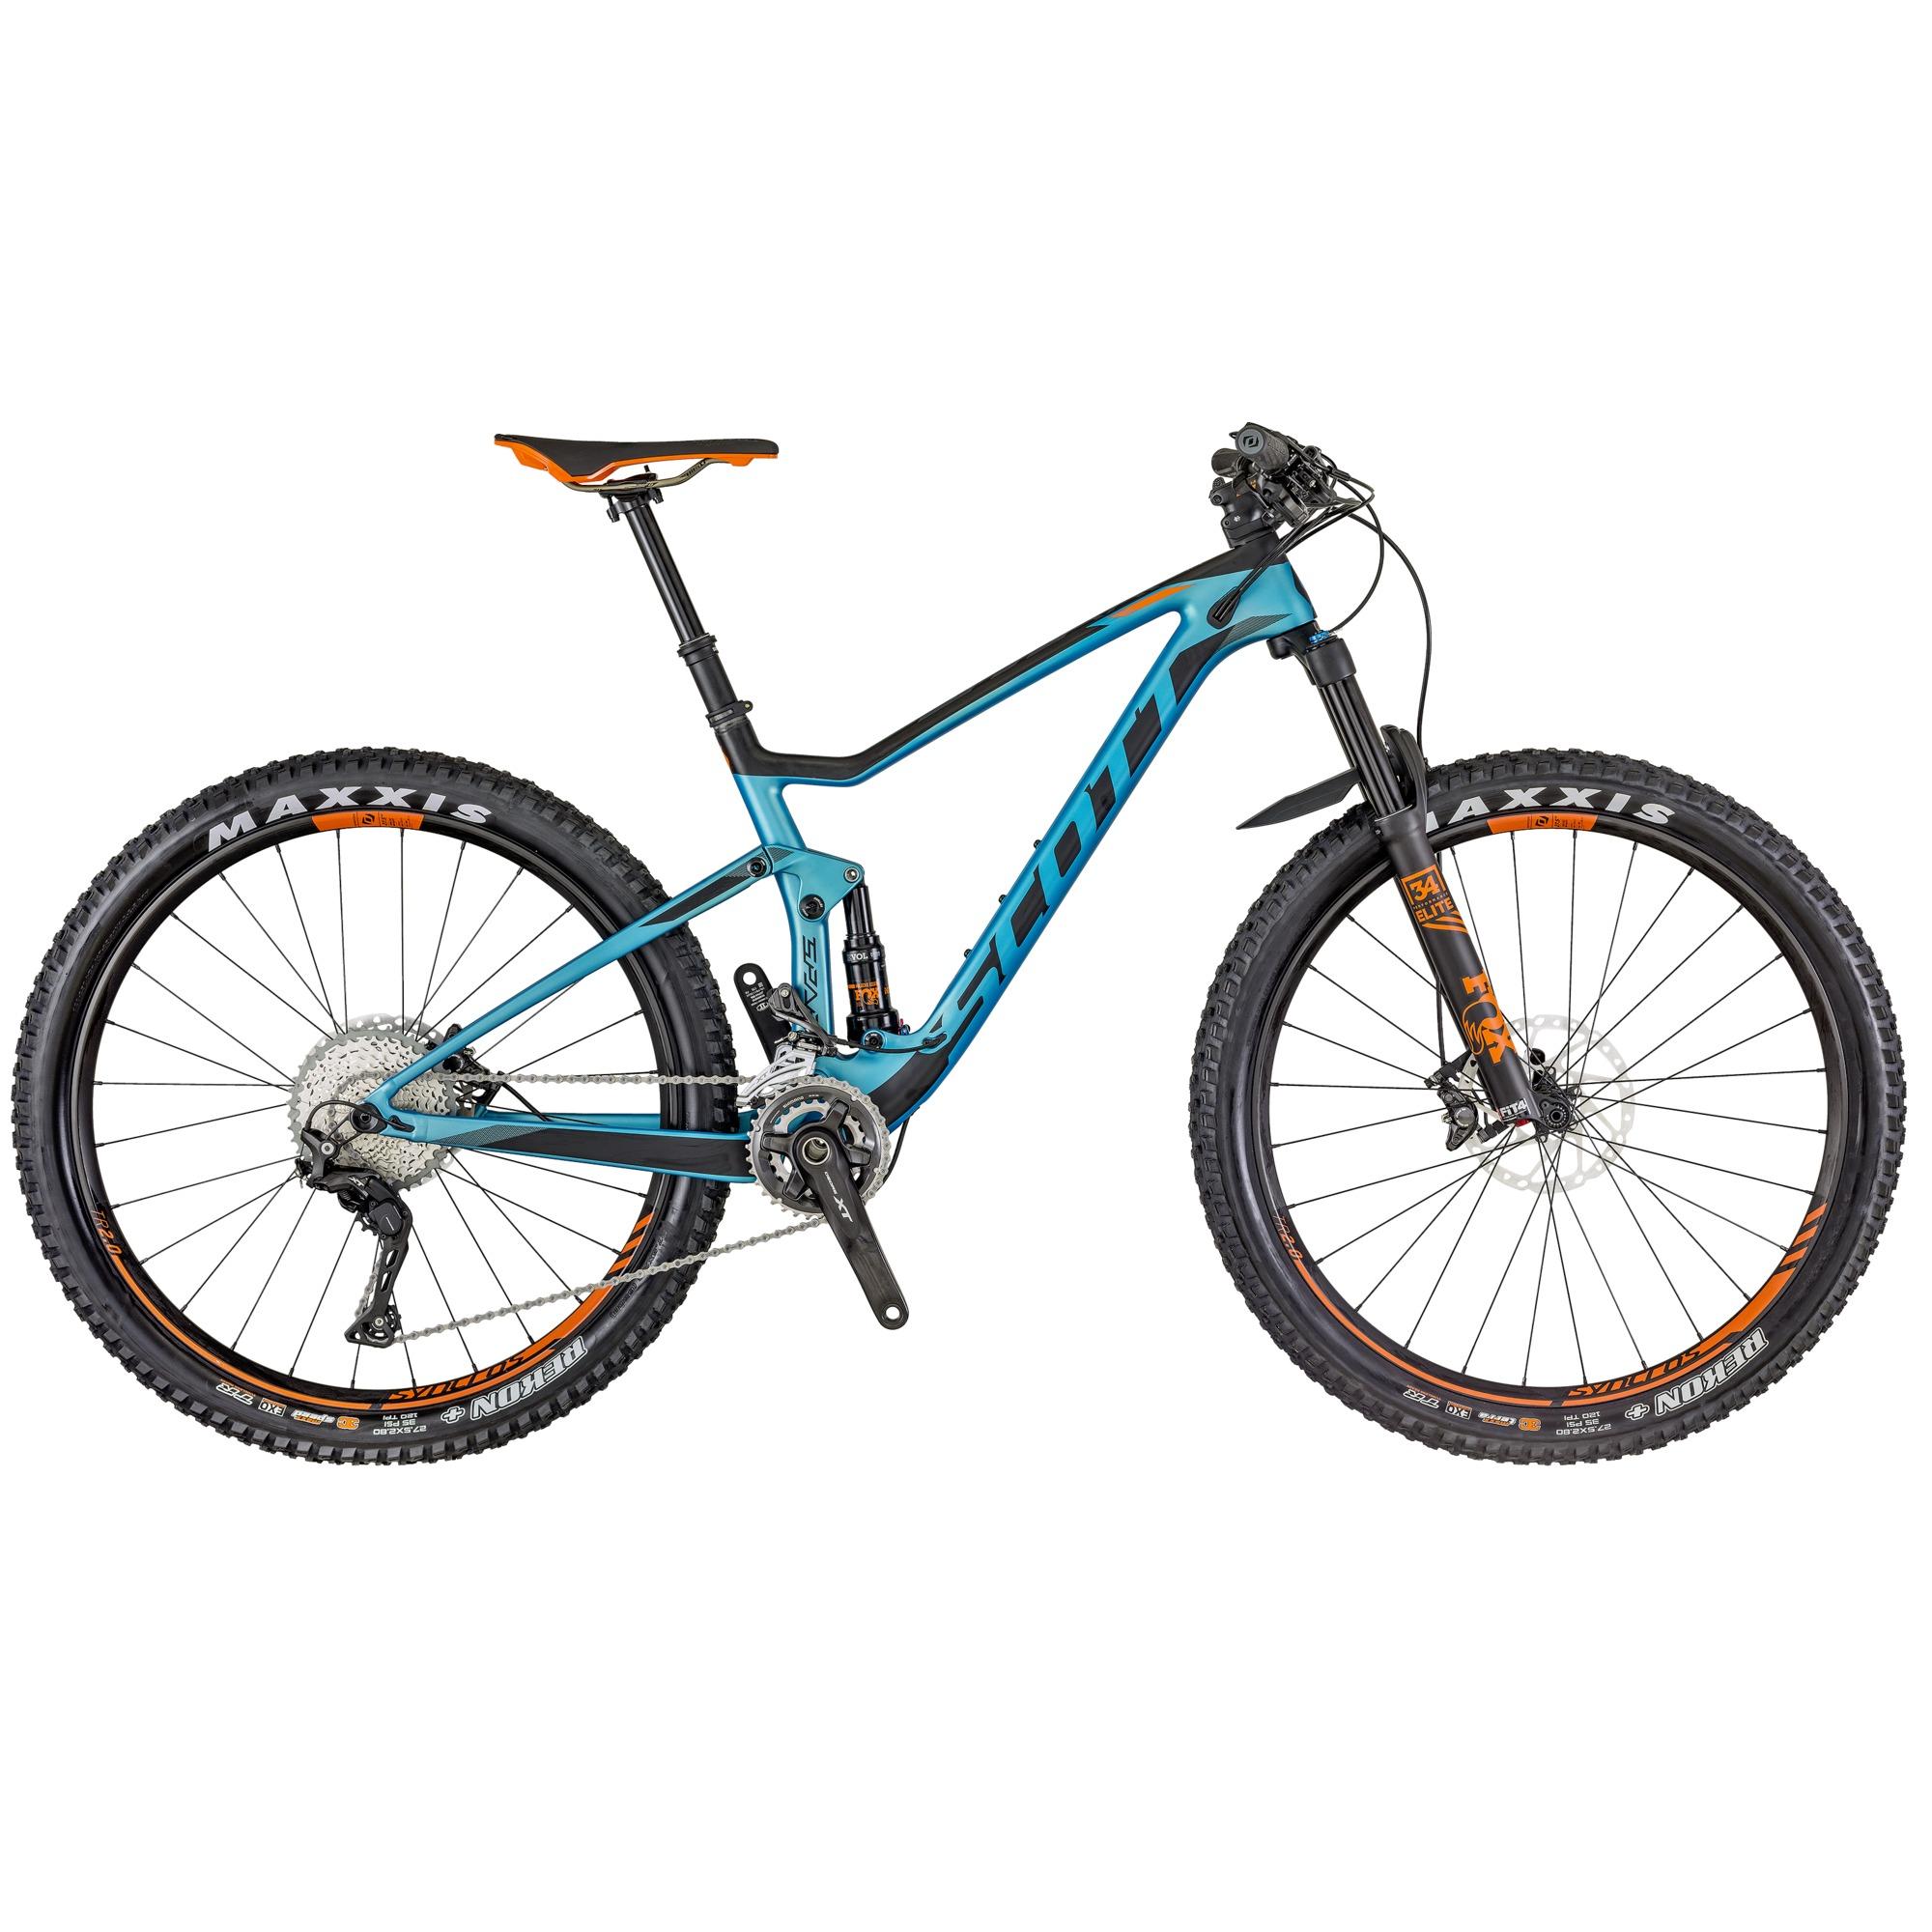 SCOTT Spark 710 Bike S - Zweirad Homann